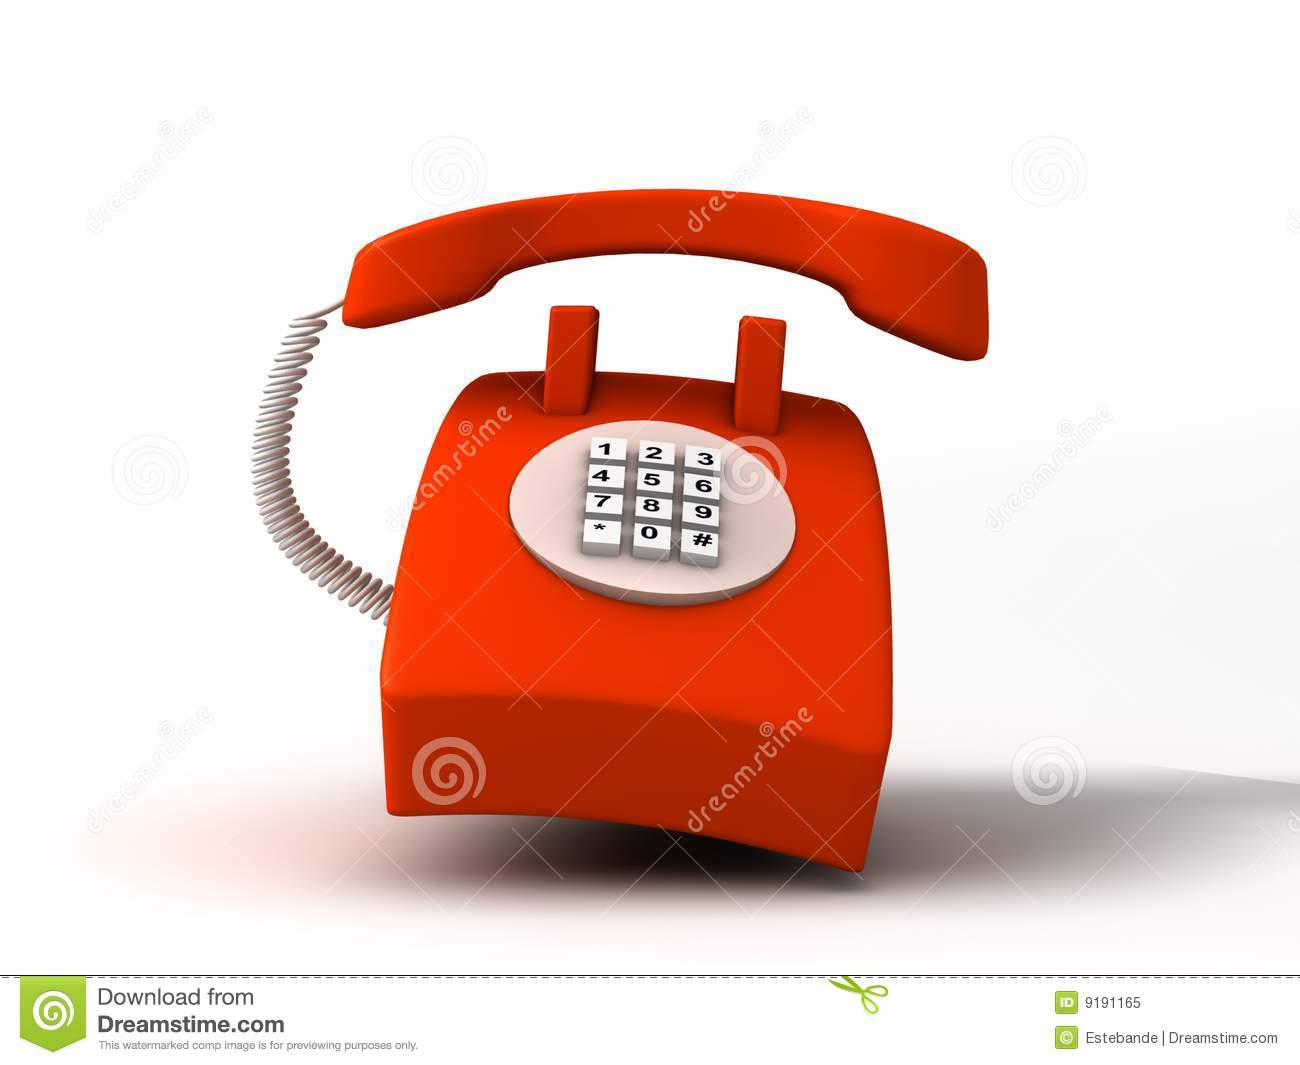 Ringing Telephone 9191165jpg